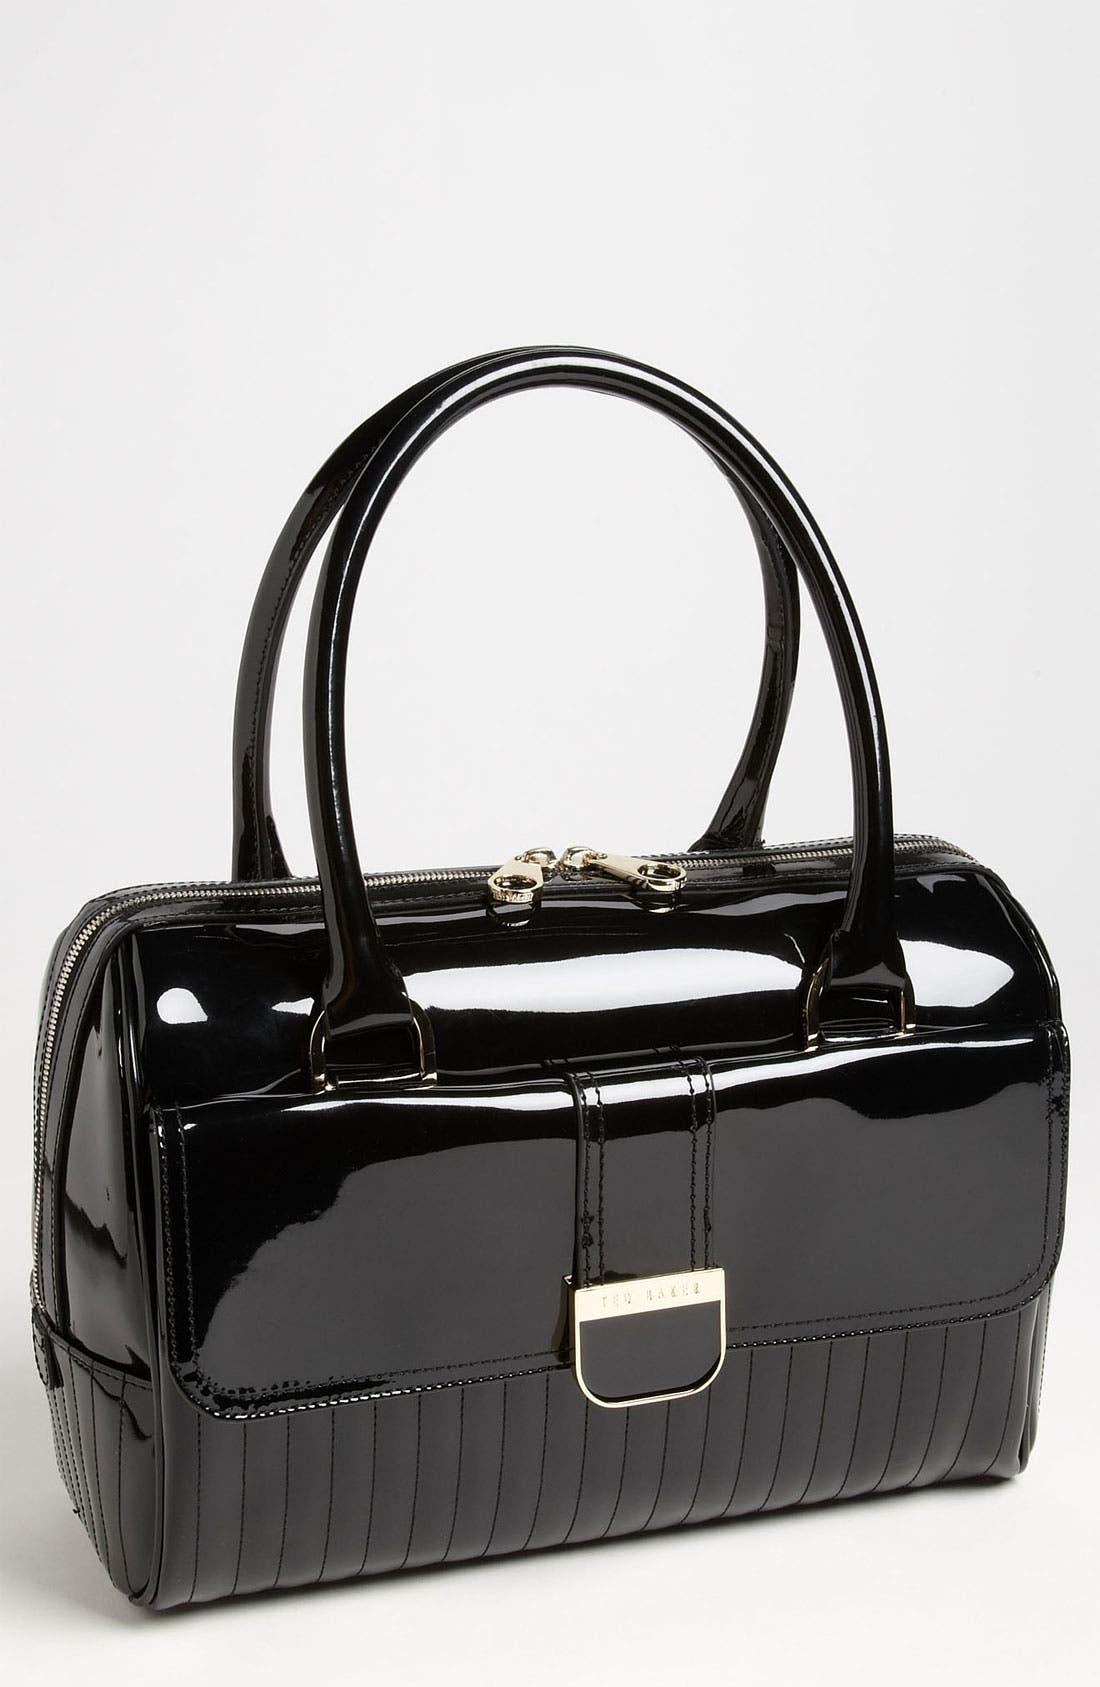 Alternate Image 1 Selected - Ted Baker London 'Enamel' Quilted Bowler Bag